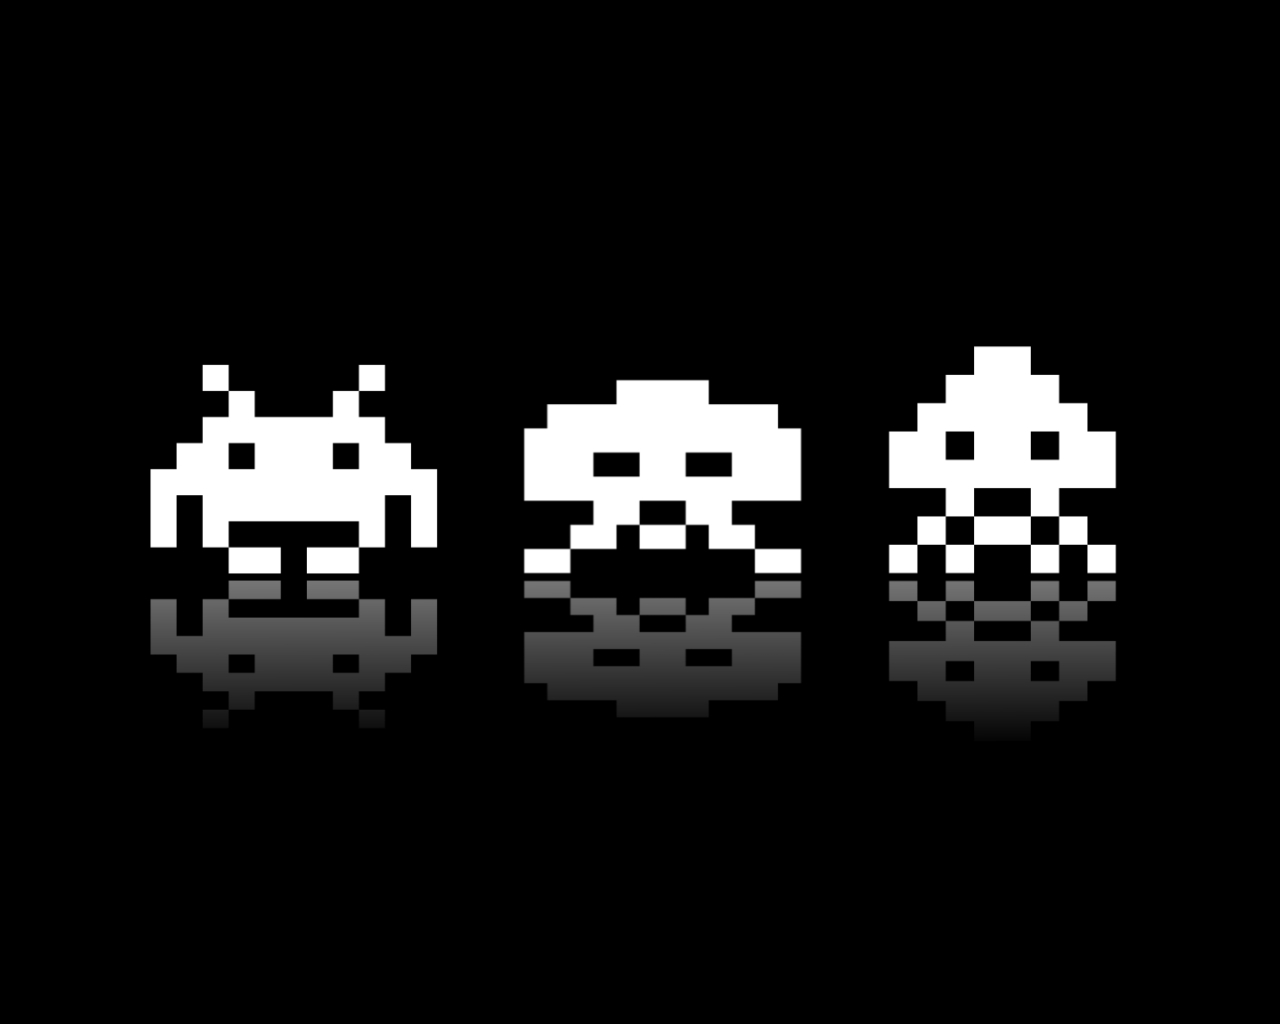 Space Ivader